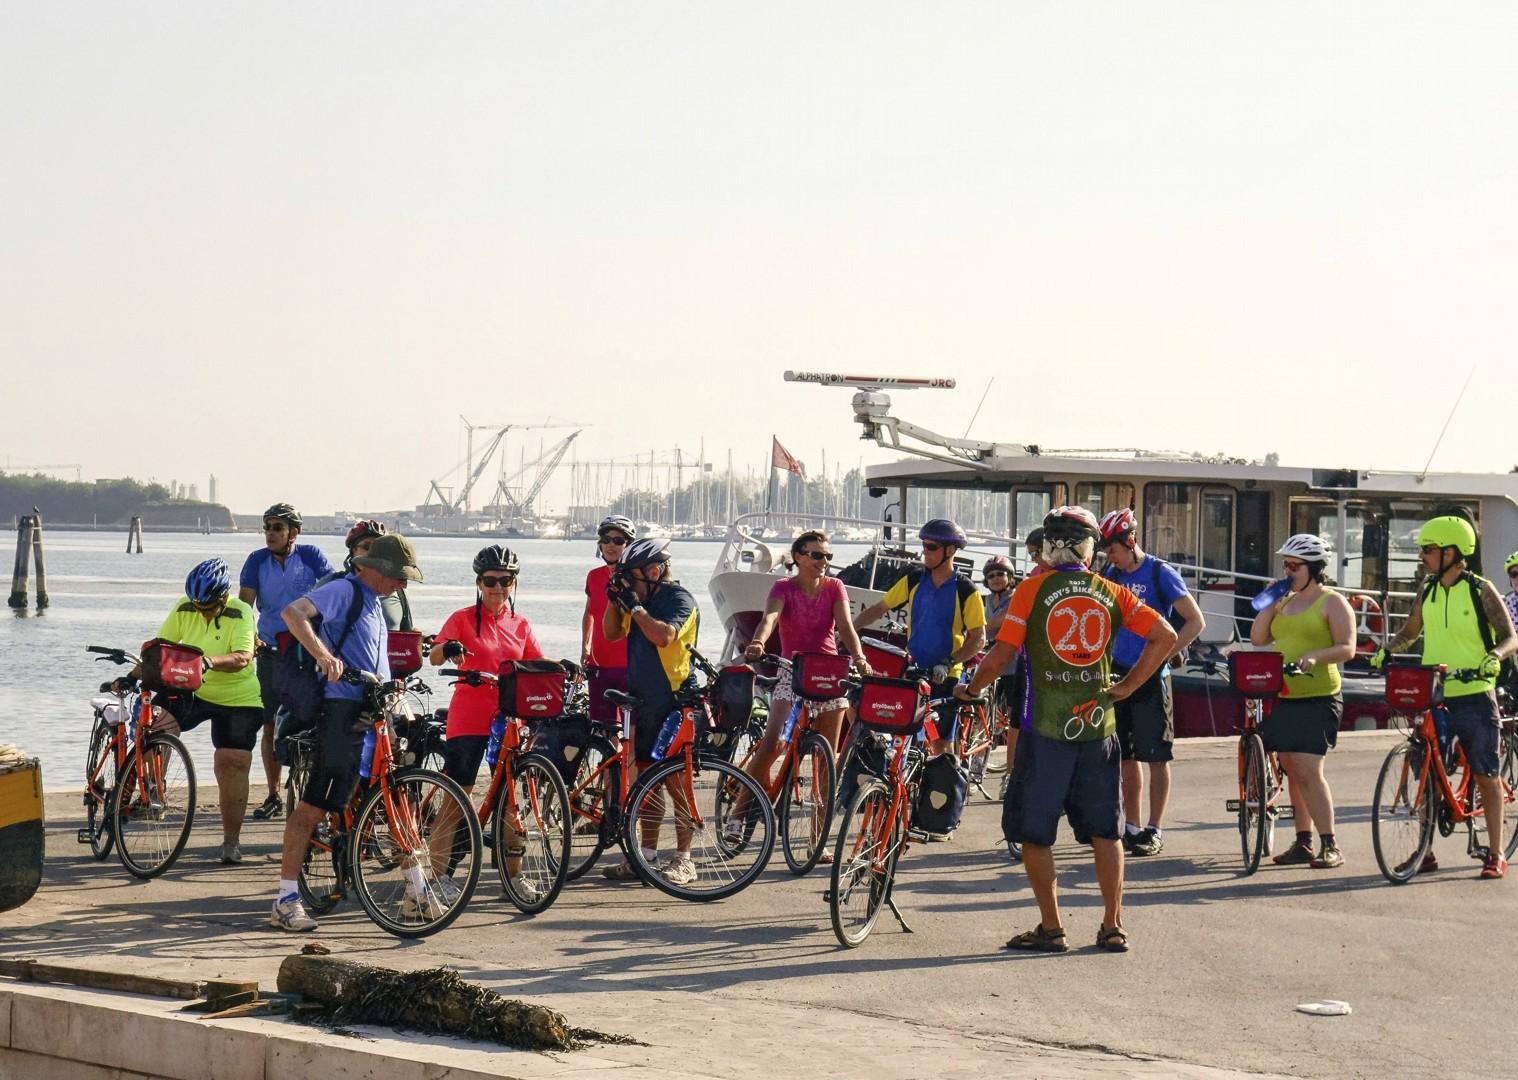 waterwaysofvenice14.jpg - Italy - Venetian Waterways (Venice to Mantova) - Bike and Barge Holiday - Leisure Cycling